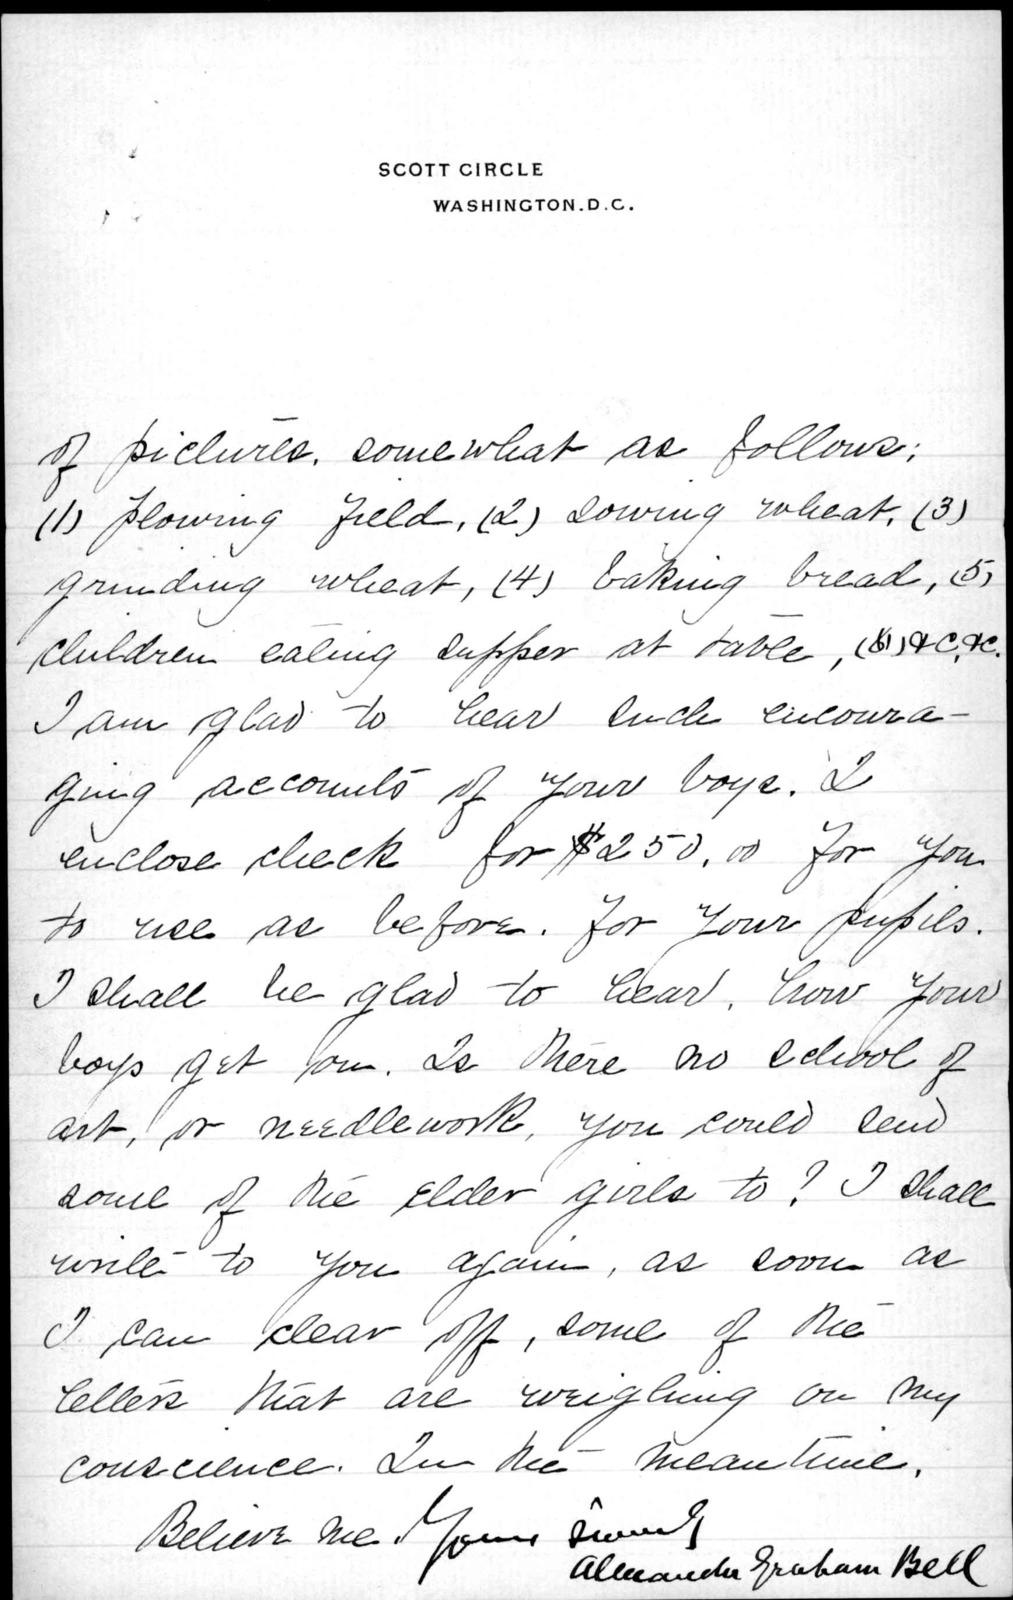 Letter from Alexander Graham Bell to Sarah Fuller, undated